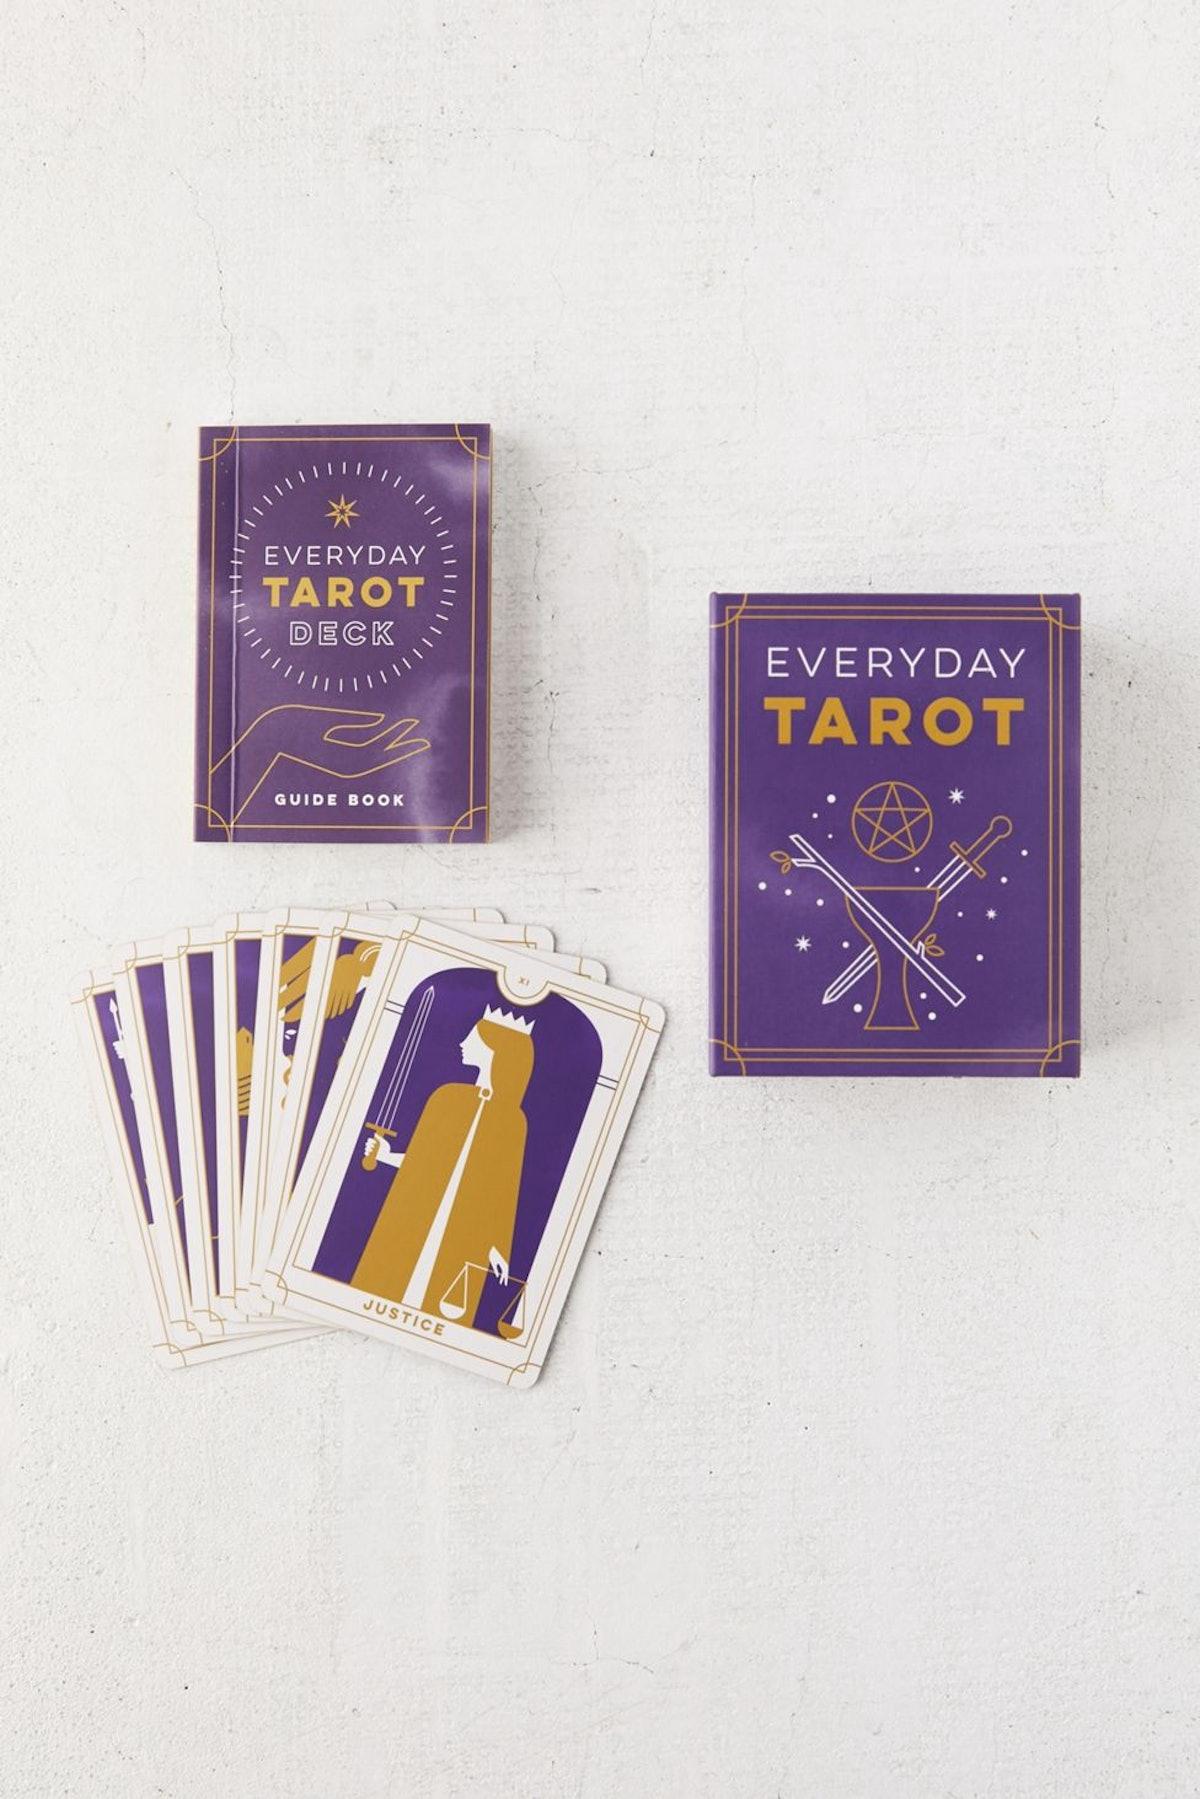 Everyday Tarot Mini Tarot Card Deck + Guide Book By Brigit Esselmont